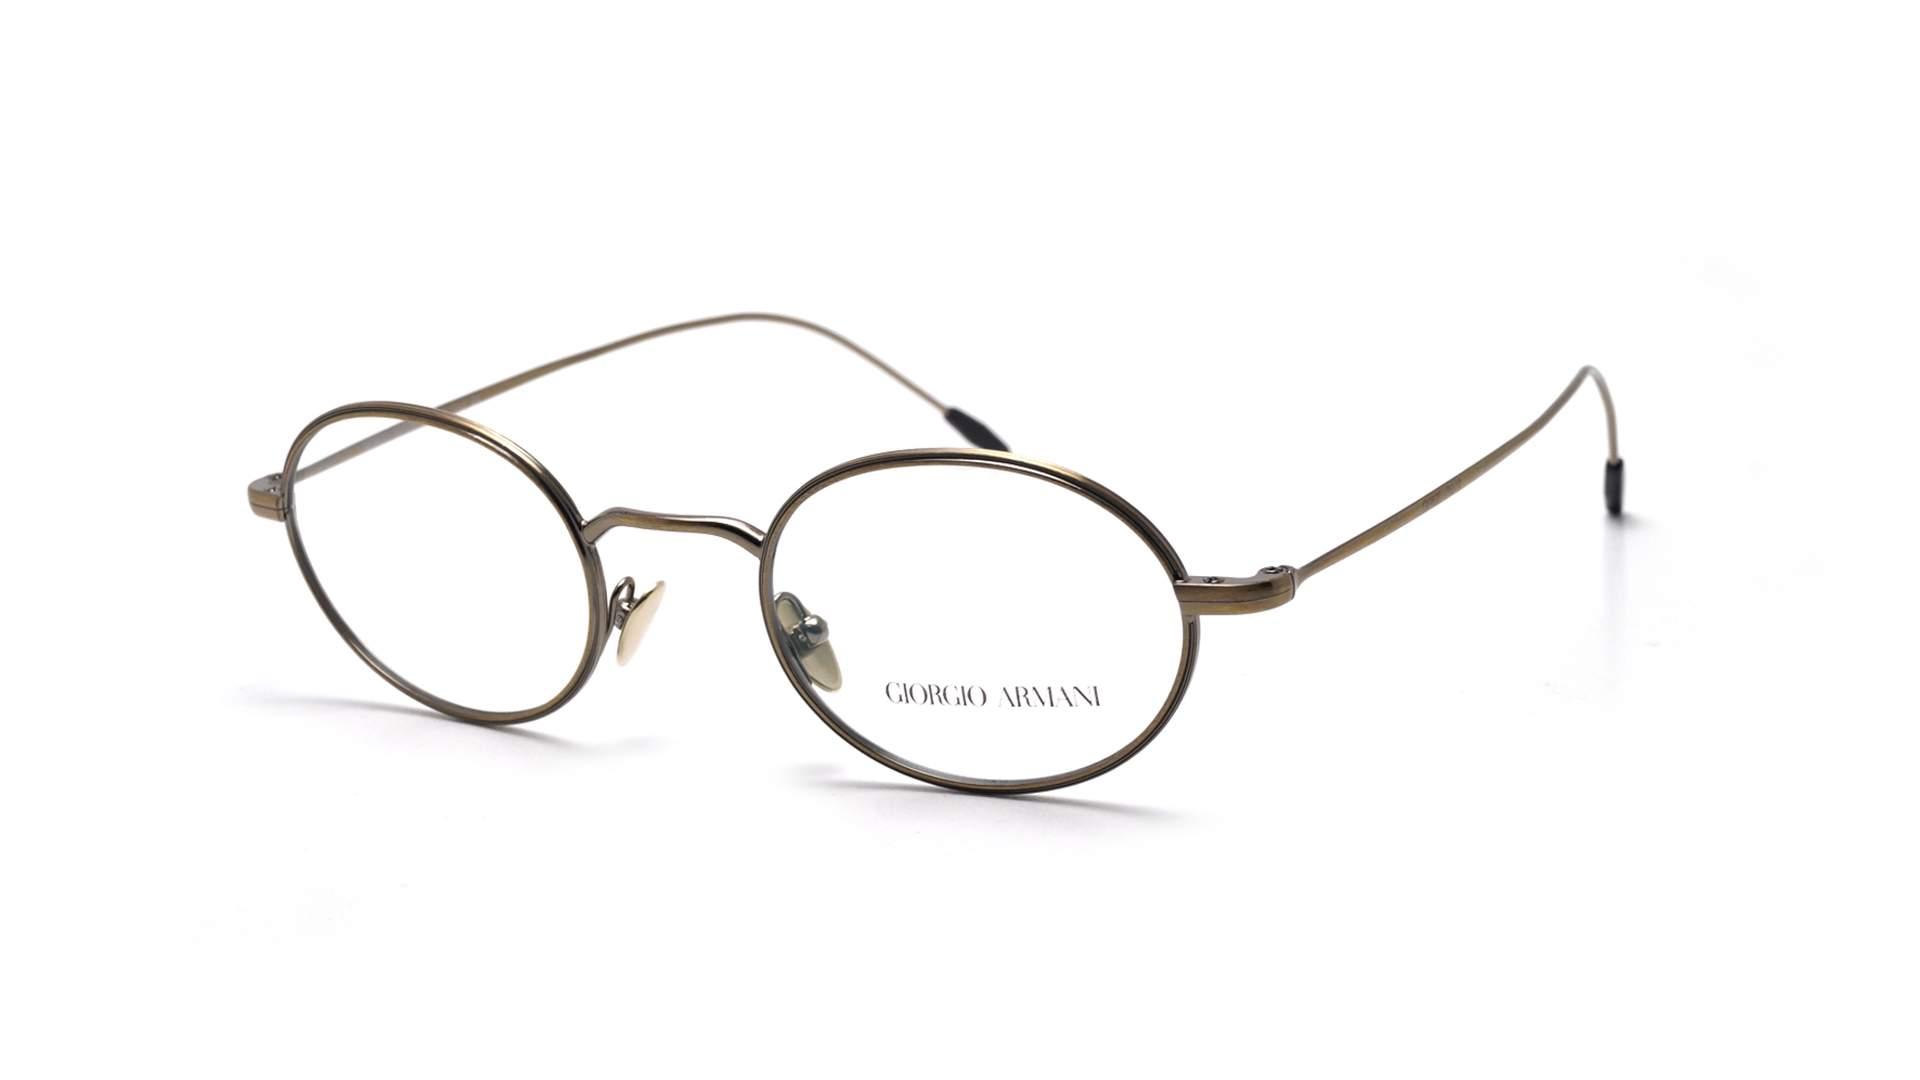 ccb58037426a Eyeglasses Giorgio Armani Frames Of Life Gold AR5076 3198 46-22 Small